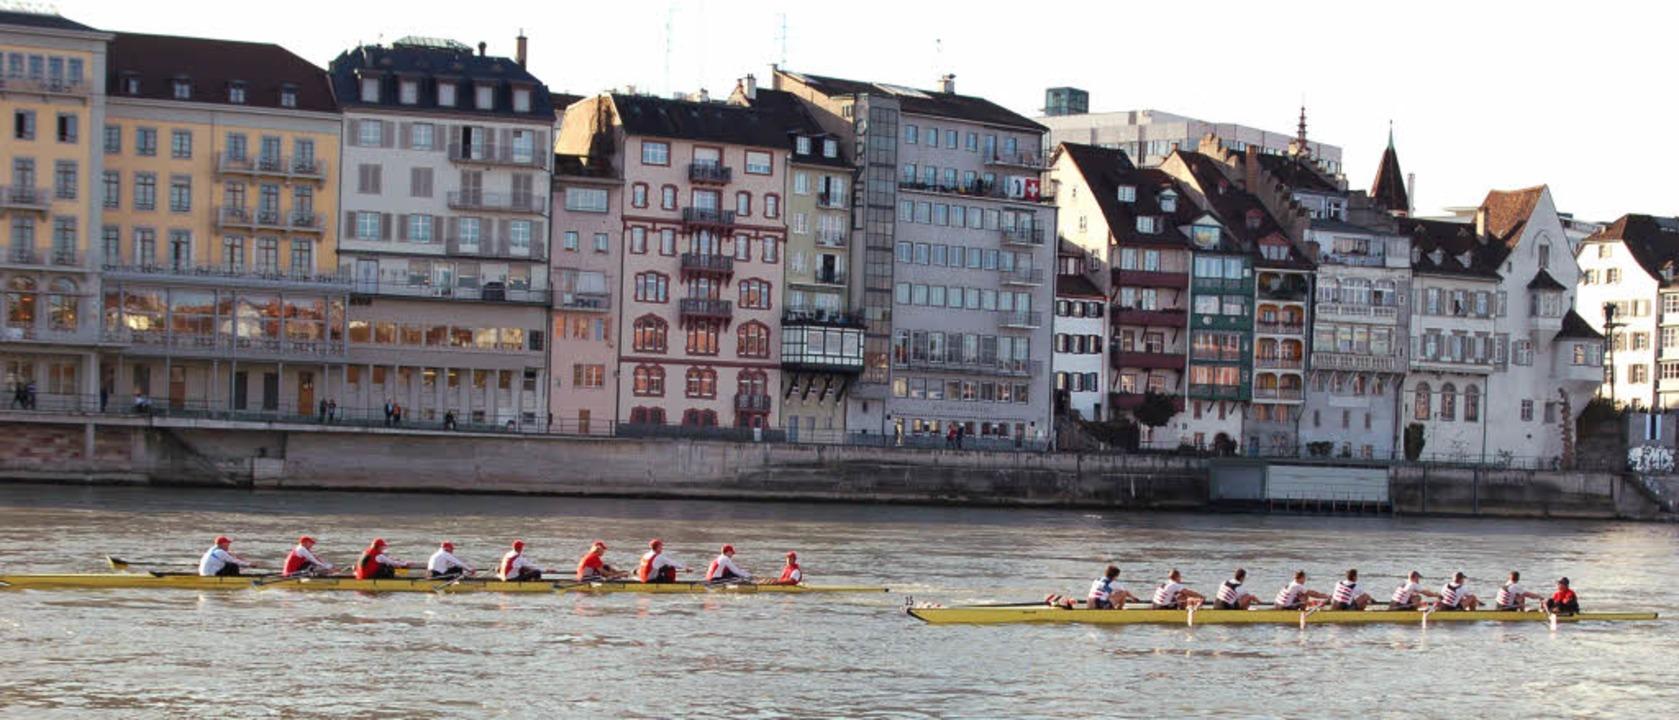 Über 6,4 Kilometer vorbei an der Basle...er beim Basel Head wohl keinen Blick.     Foto: felix held